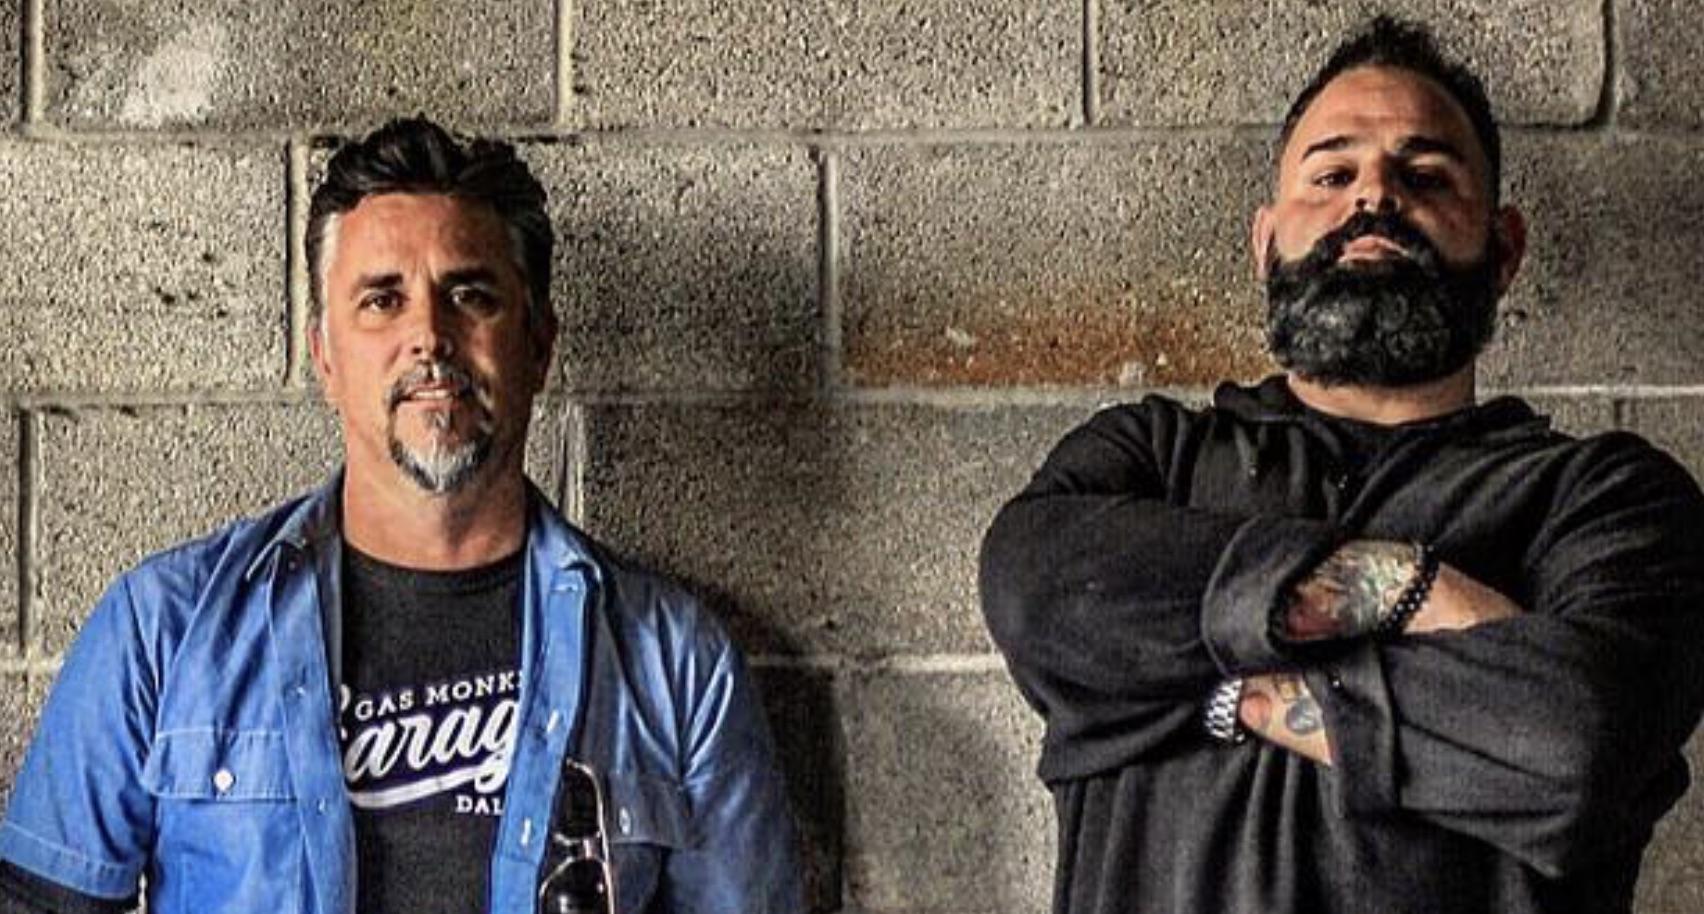 Richard Rawlings, Russell J Holmes, Garage Rehab-https://www.instagram.com/p/BX-hgr2lj0G/